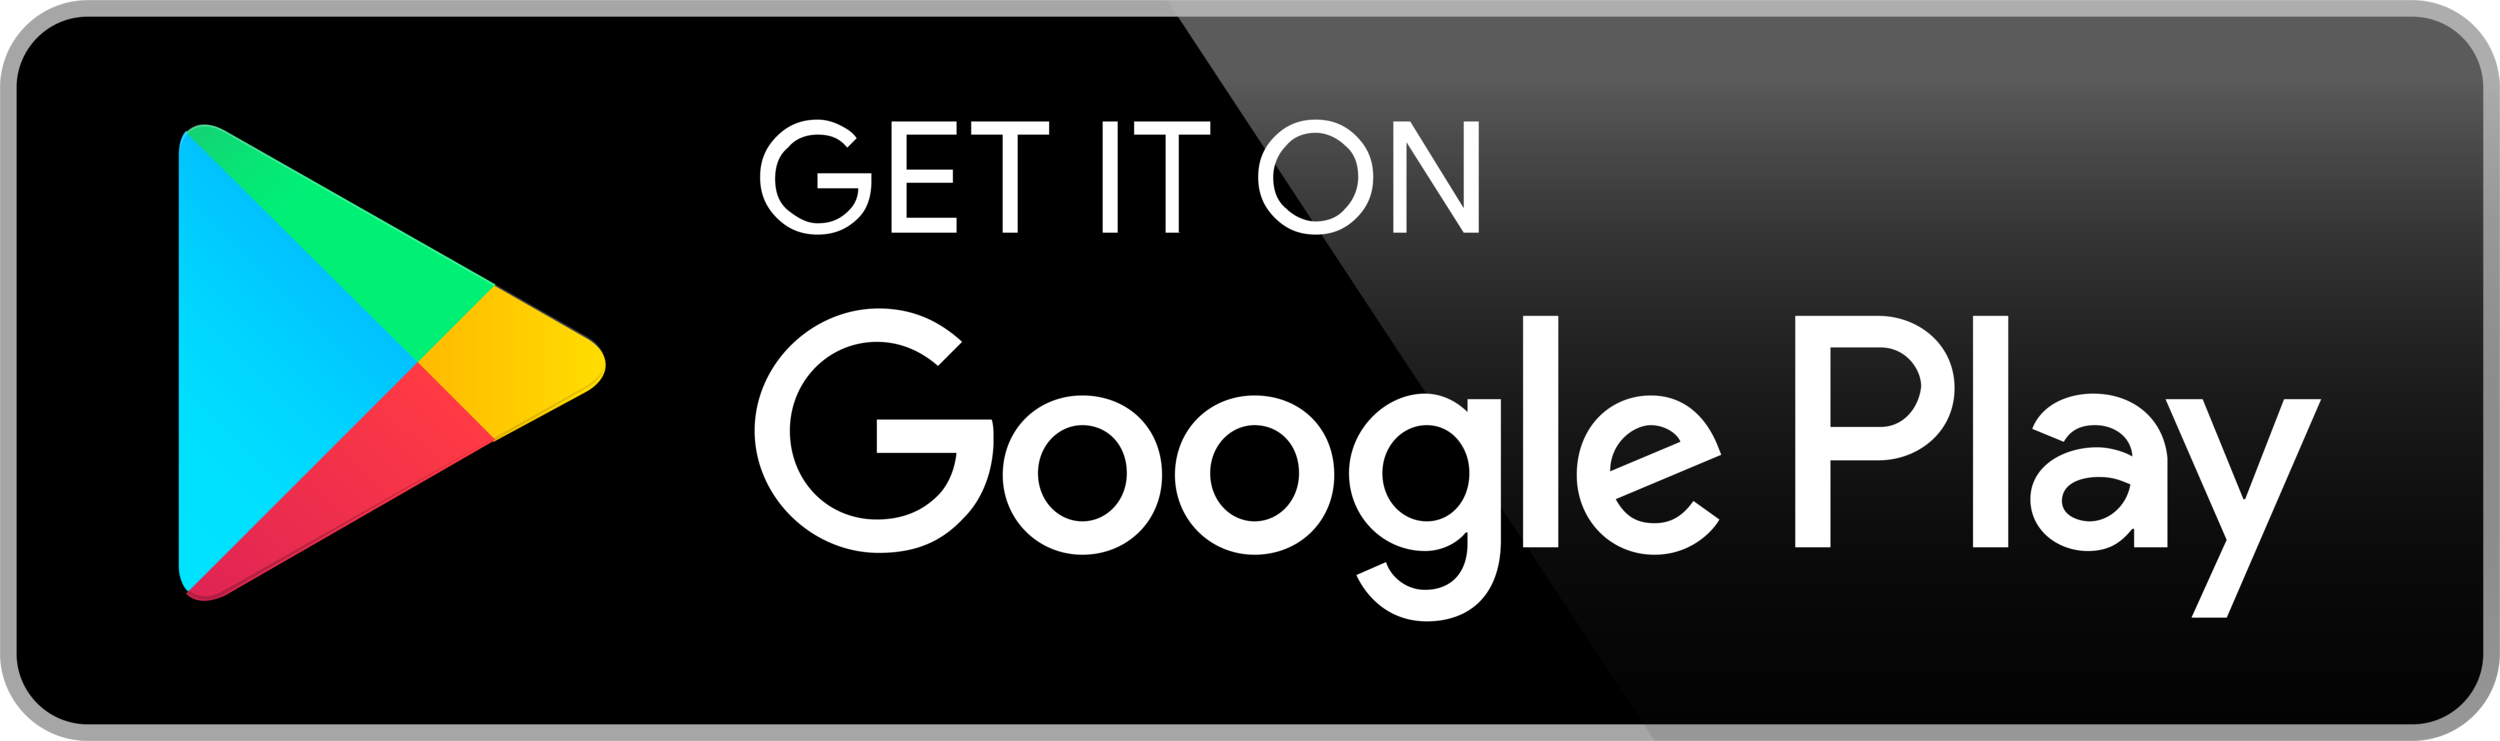 Google Play logo PM version-01.png